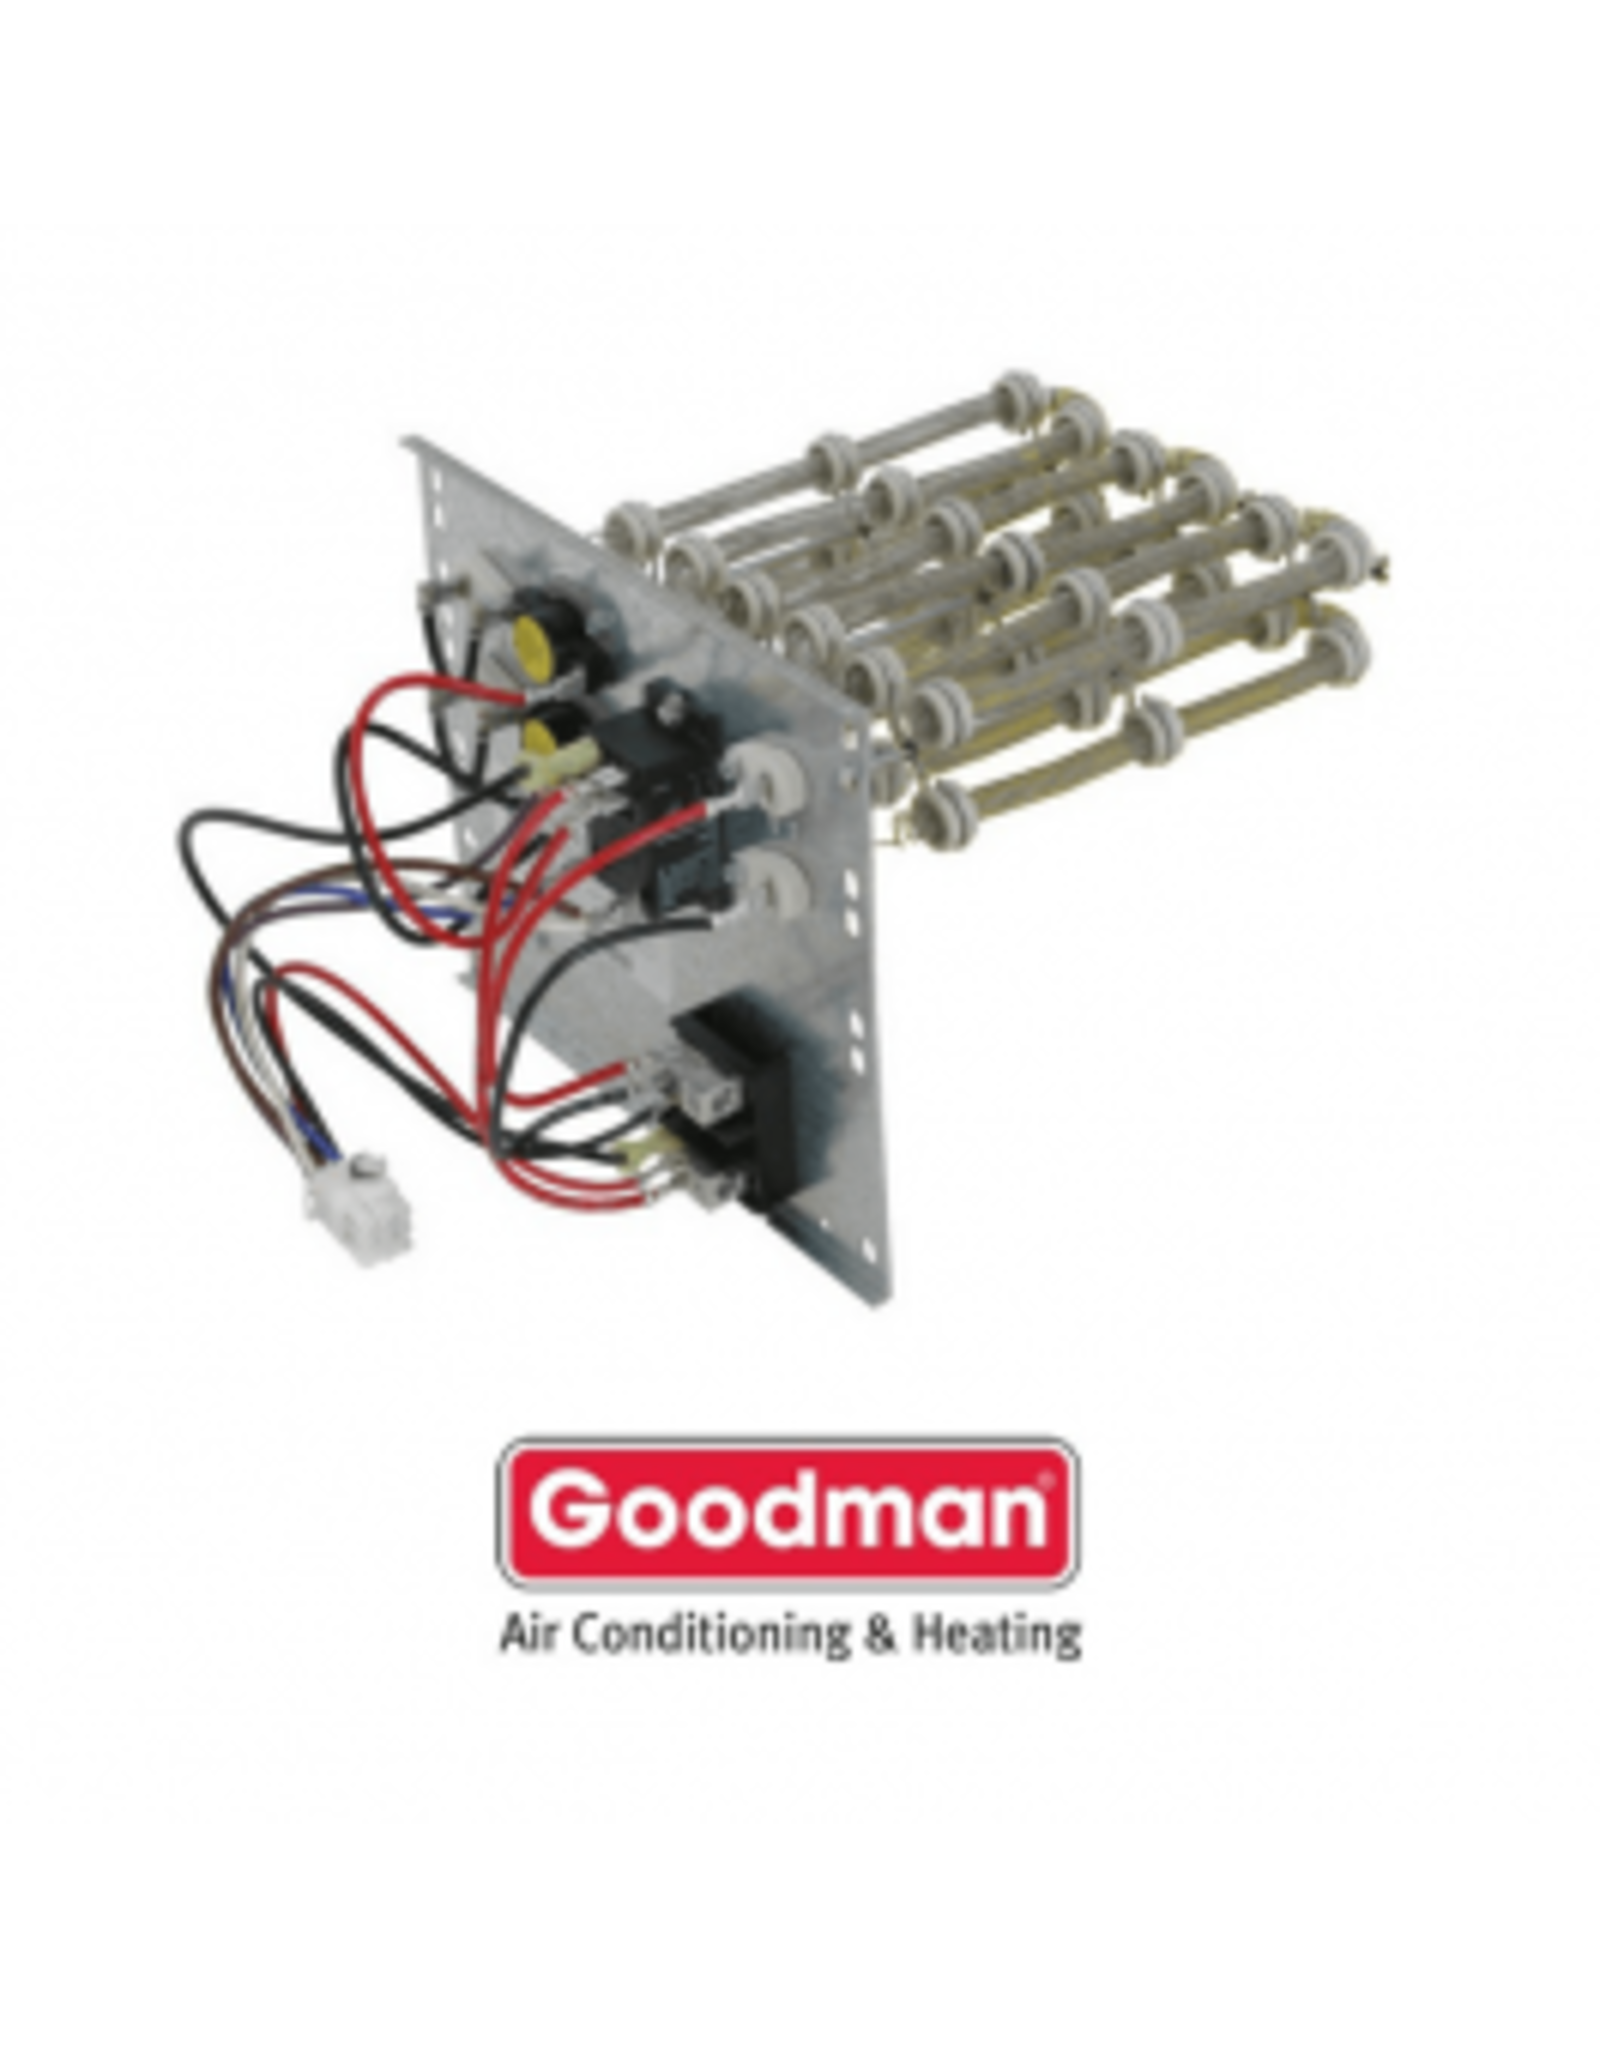 Goodman HKSC08XC | 8KW ELECTRIC HEATER